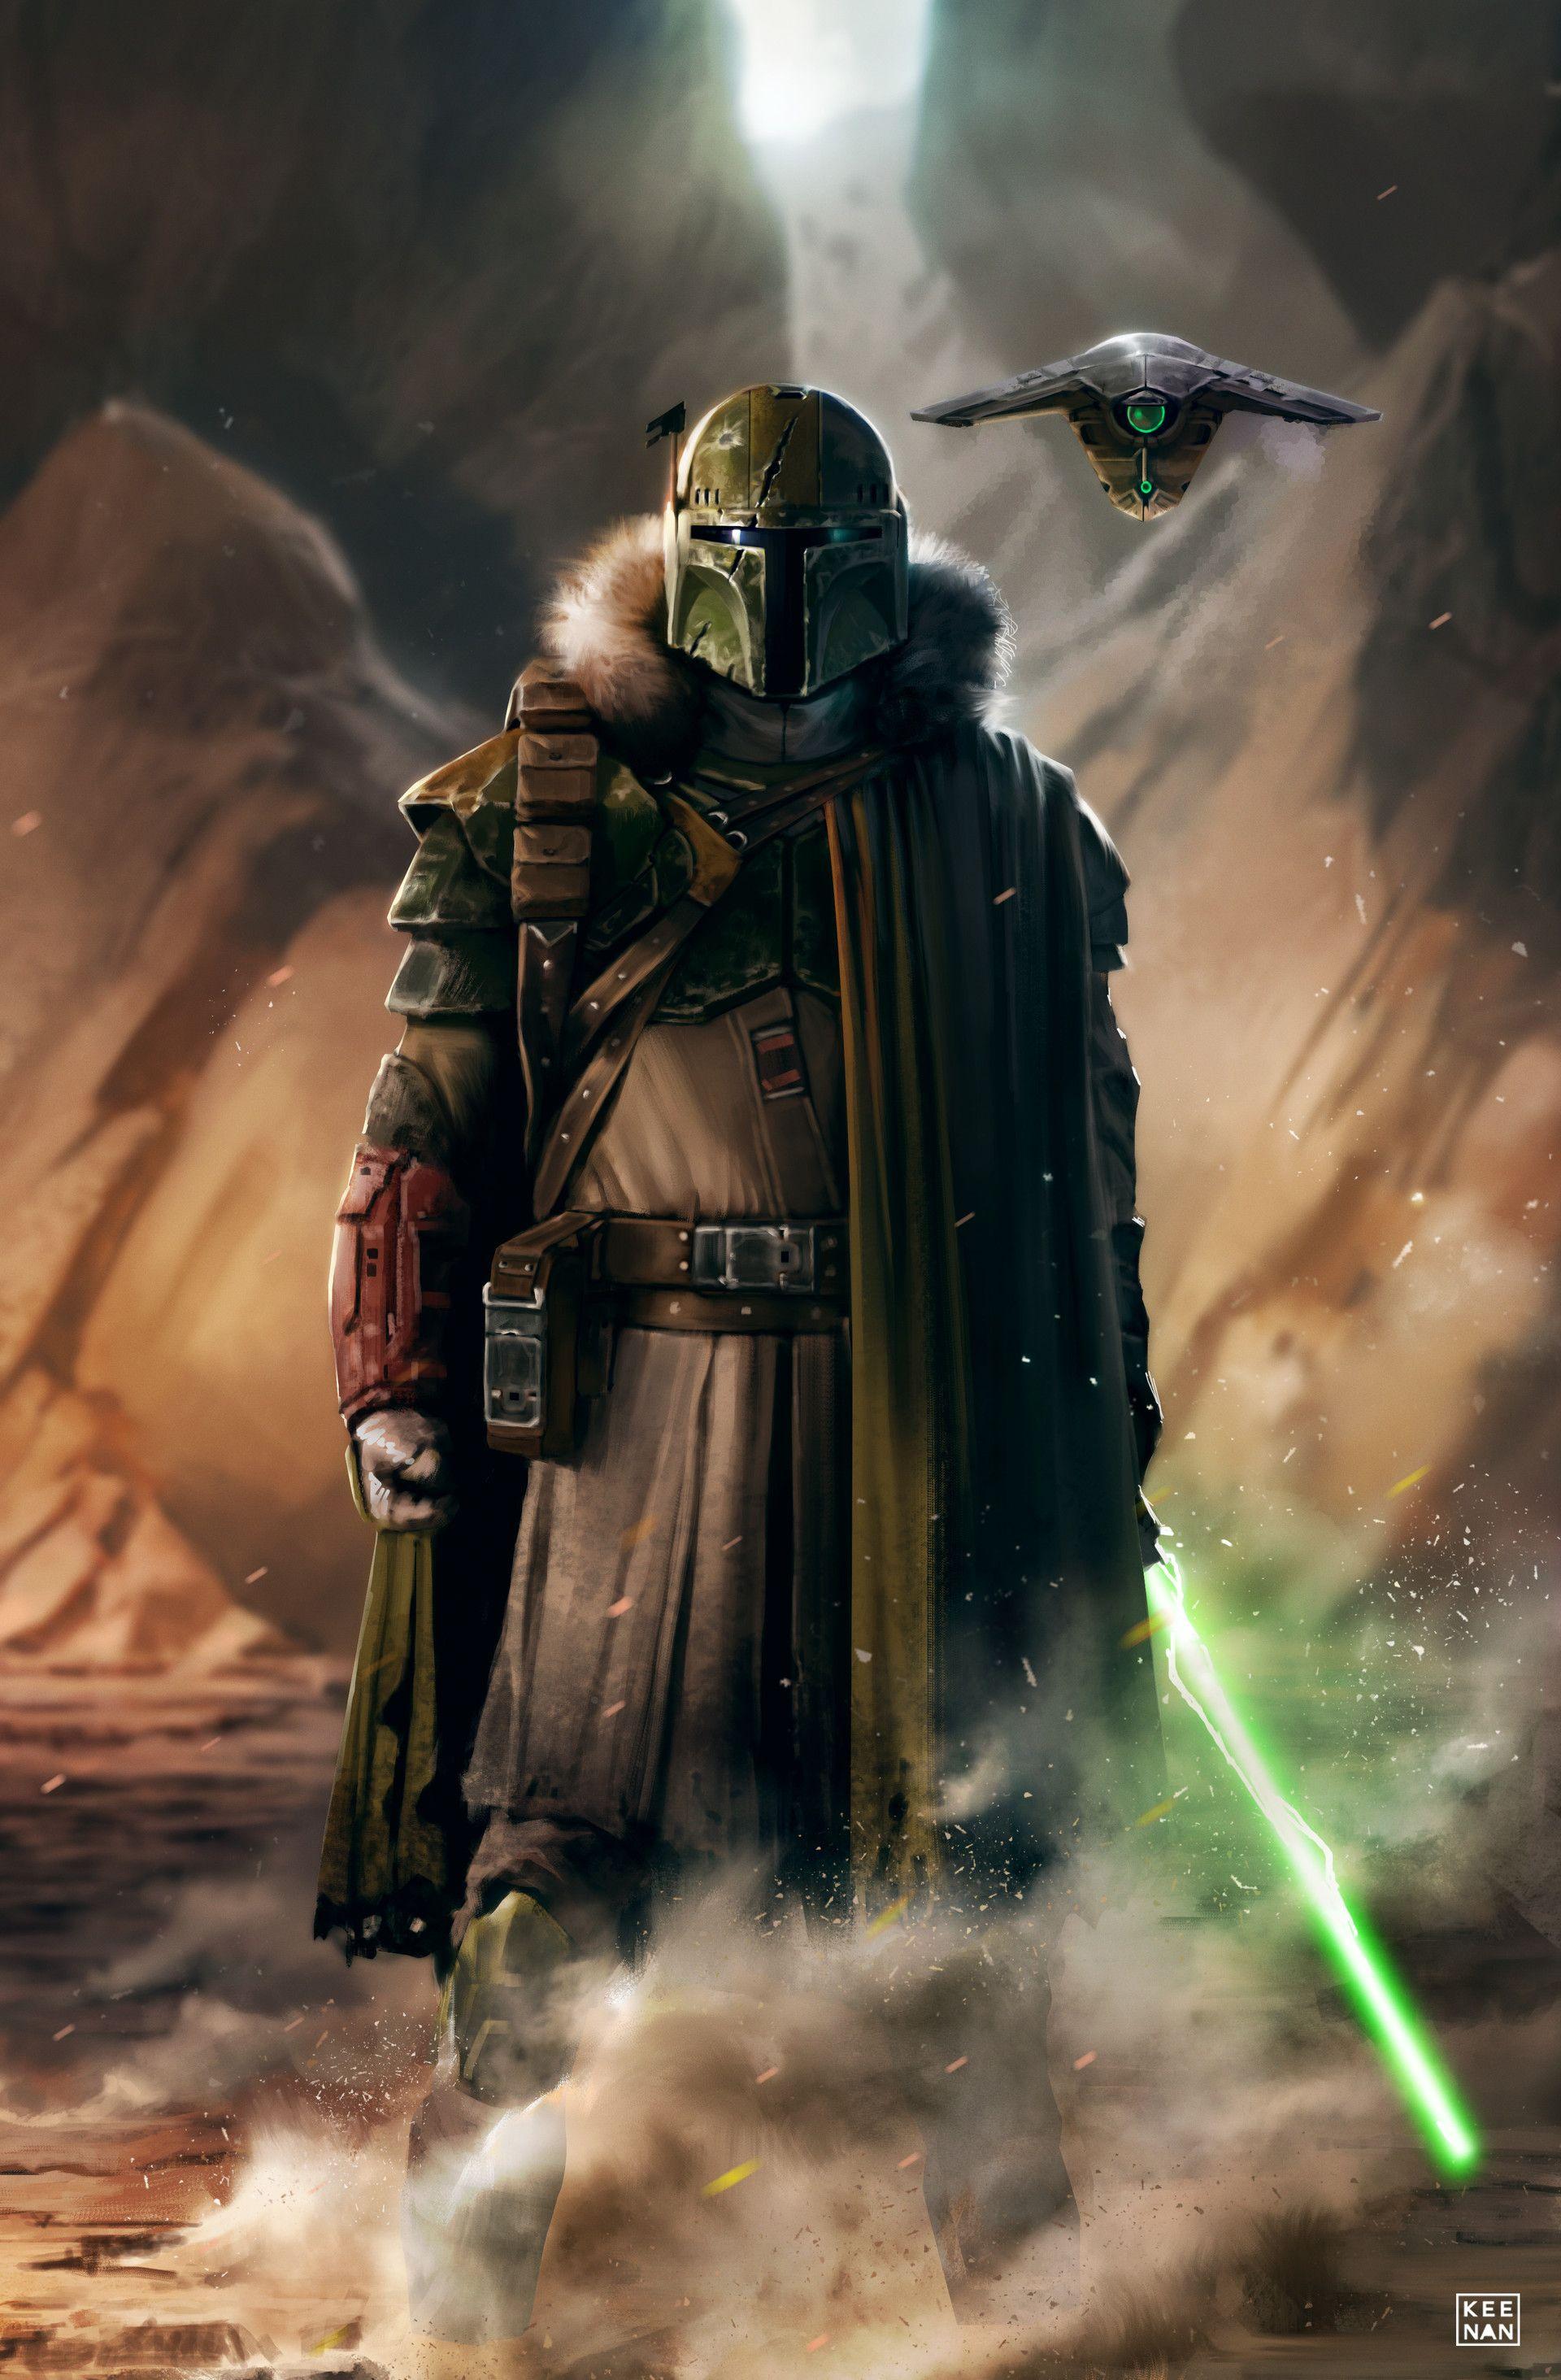 ArtStation - Jedi Fett & The Smoke Pits, Dave Keenan   Edge of the ...